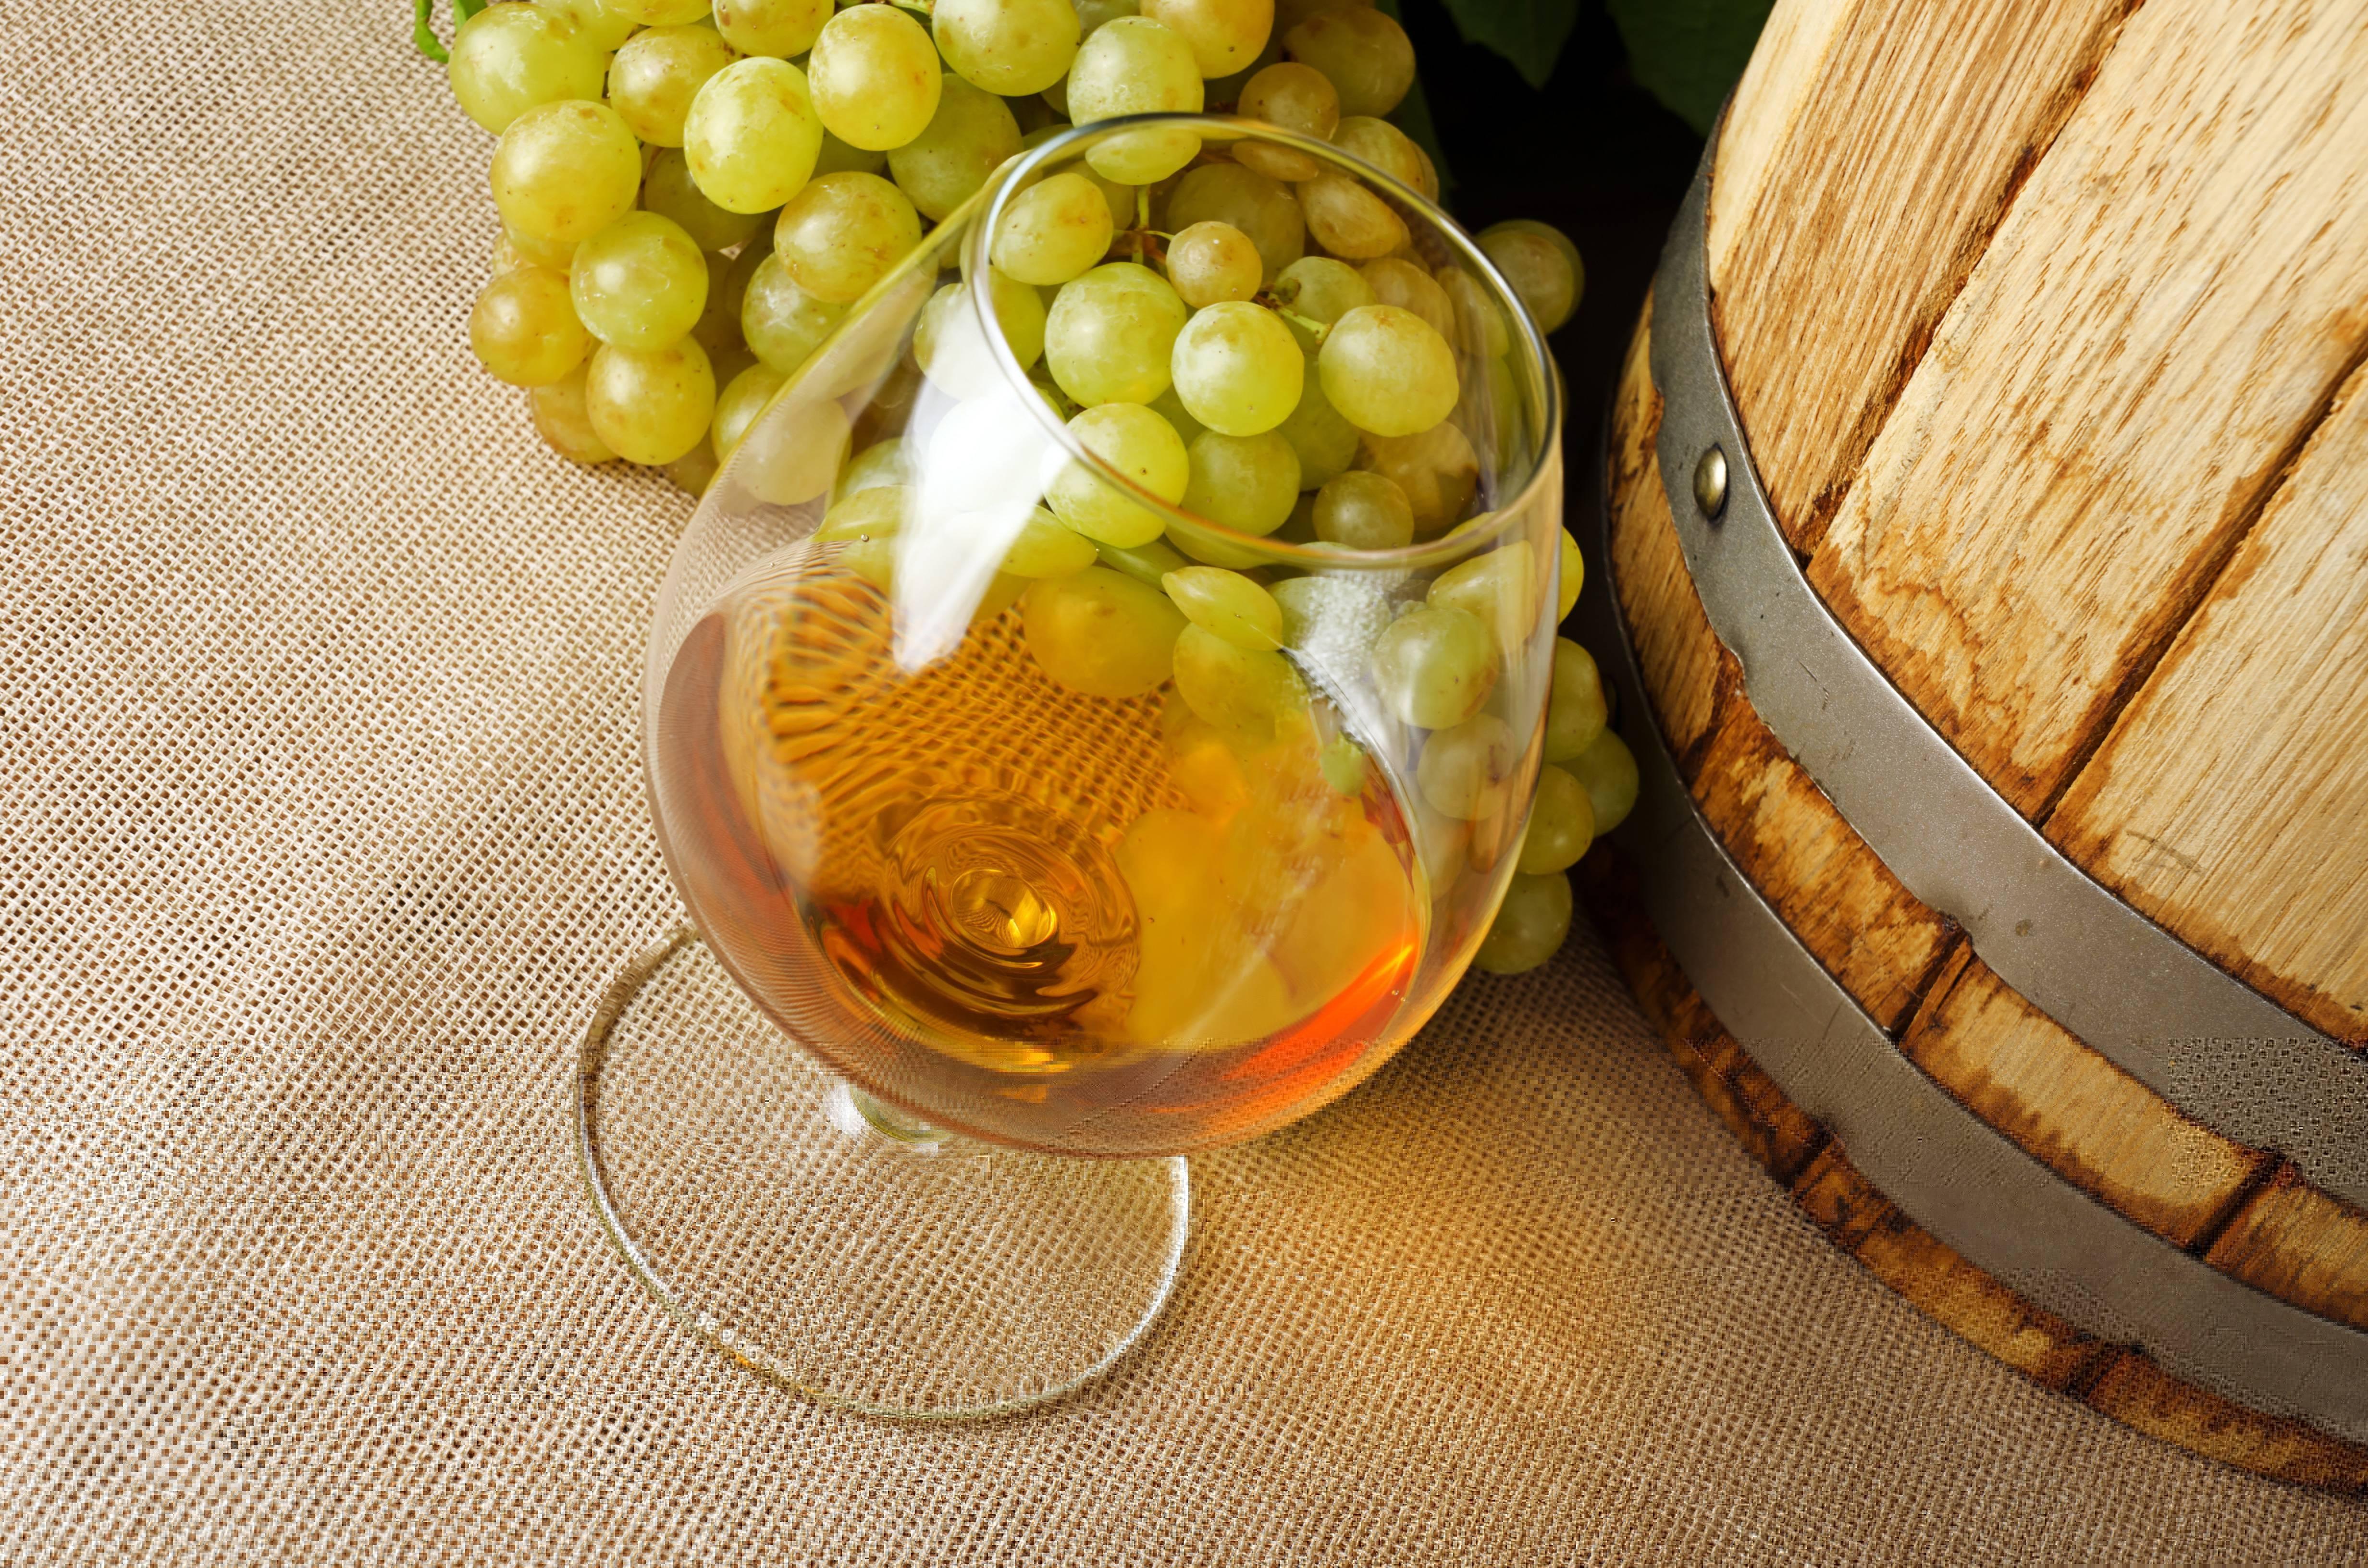 Коньяк из винограда в домашних условиях рецепт